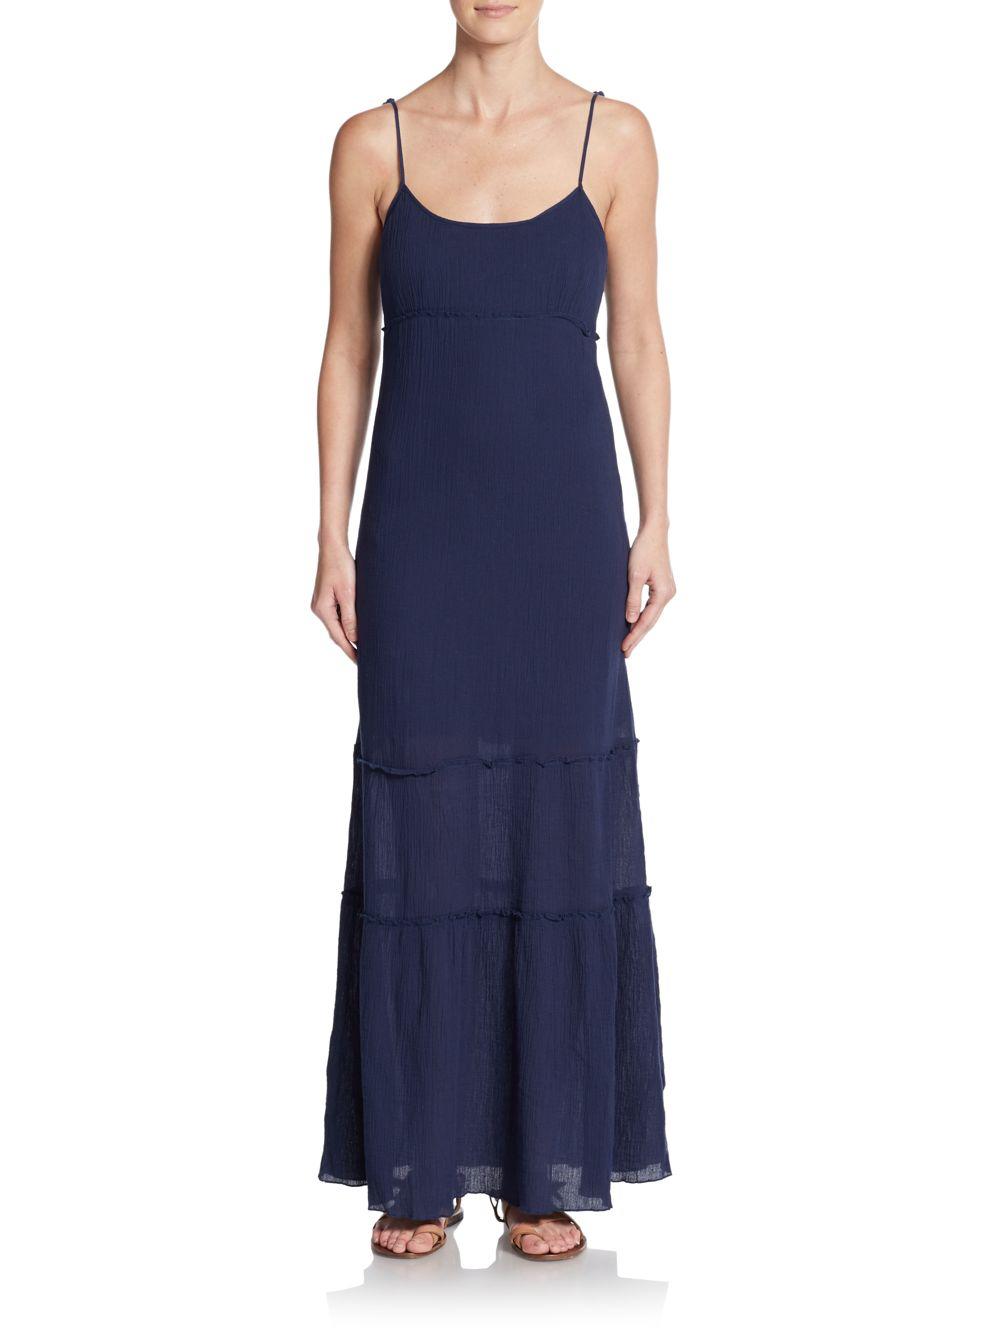 C and c california maxi dress